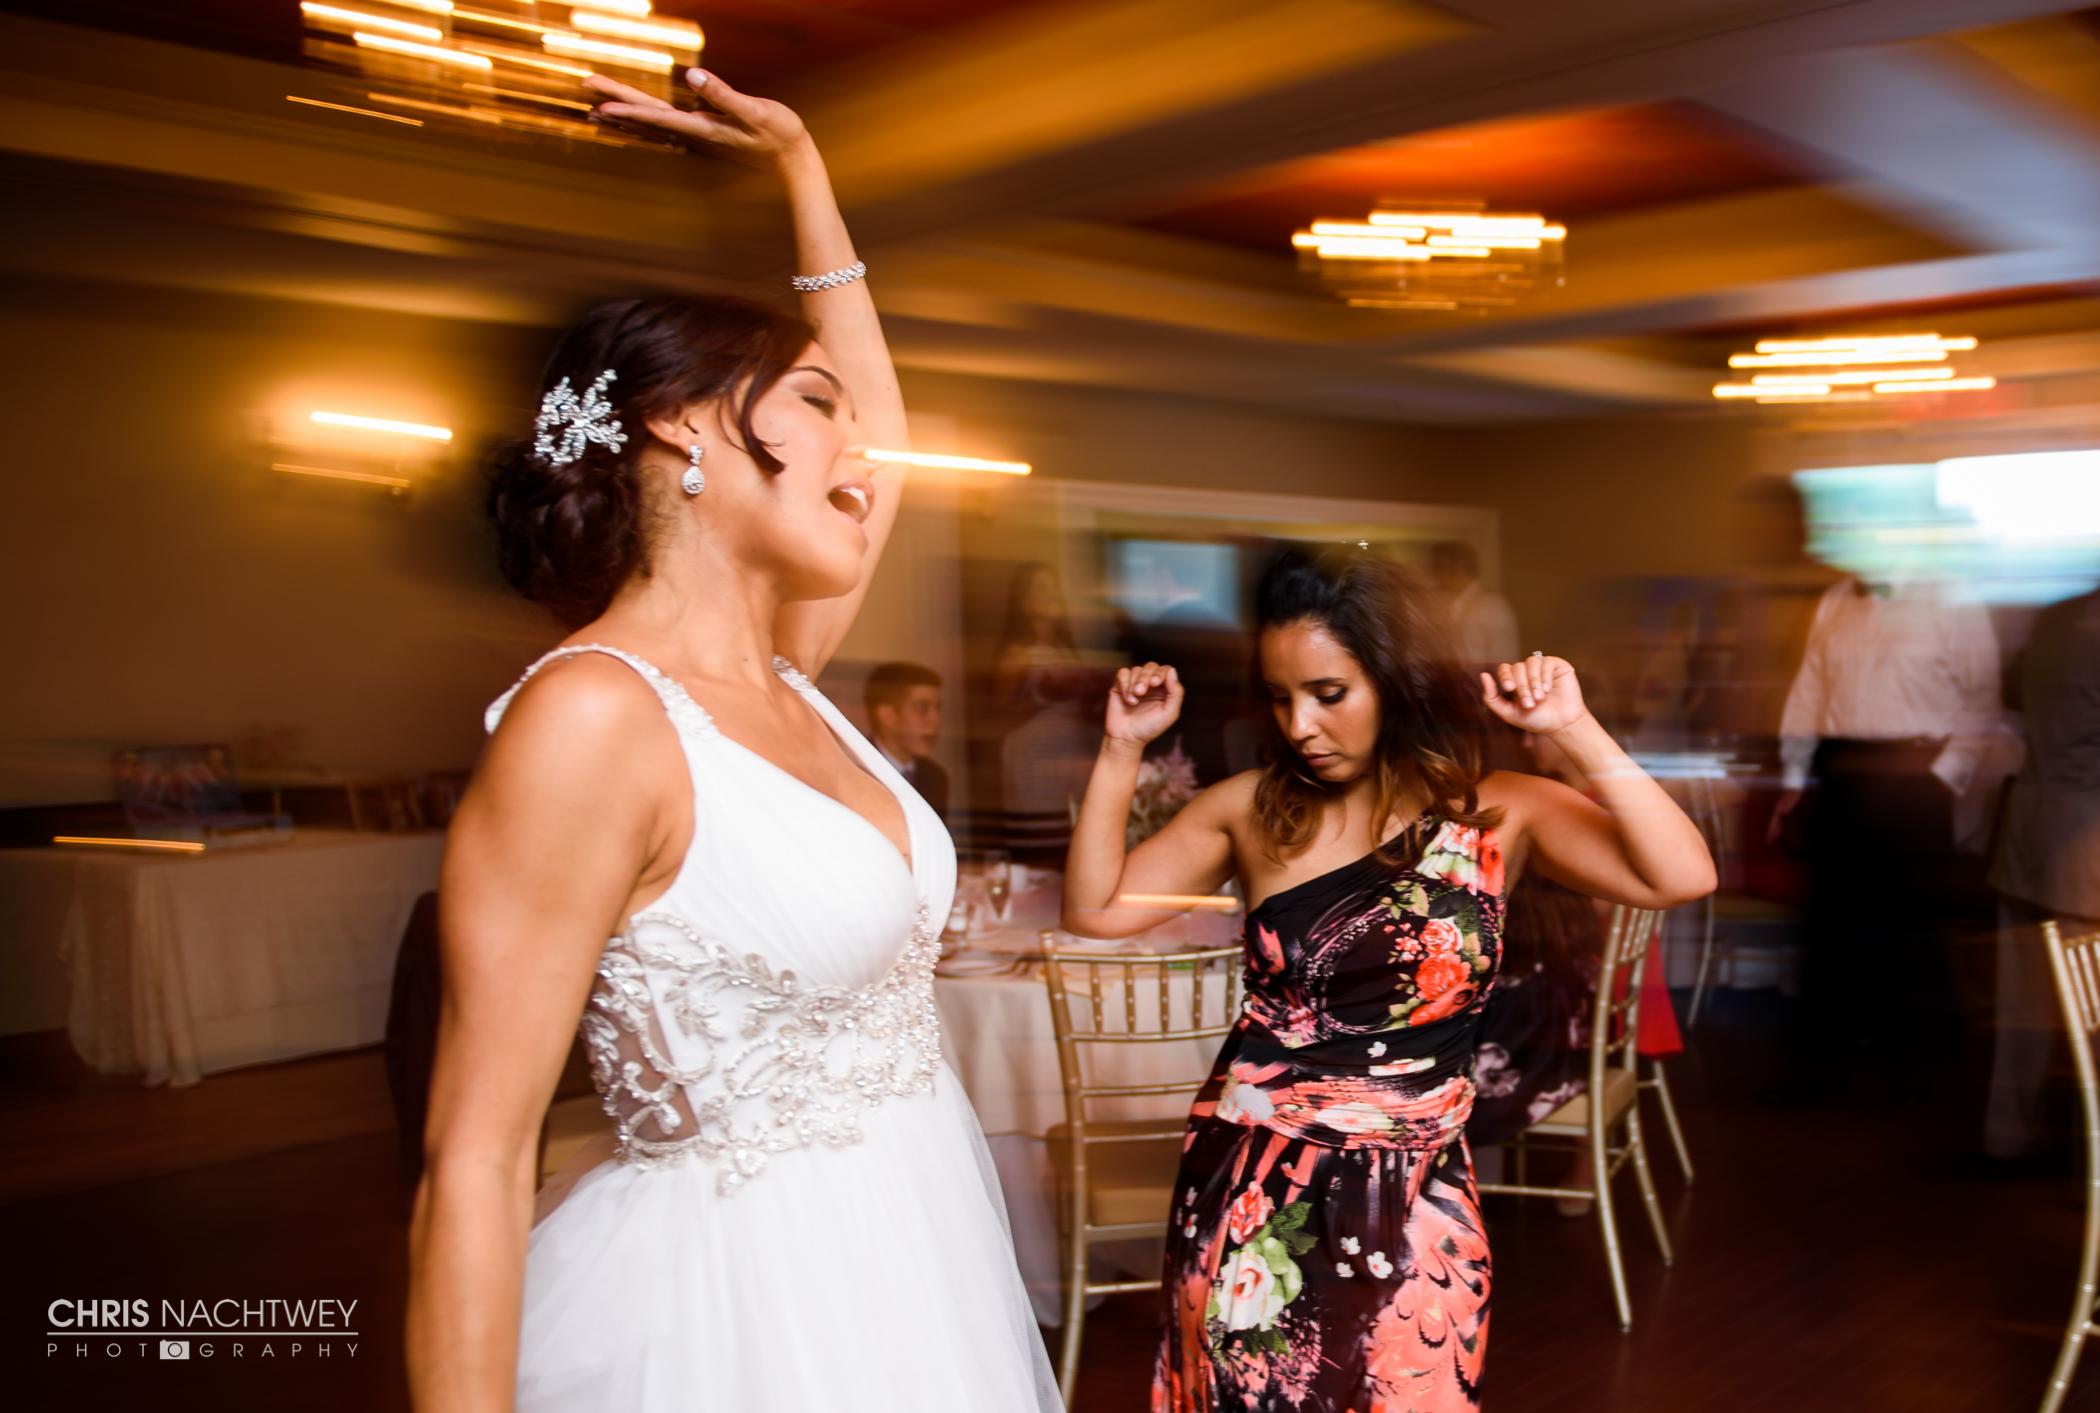 litchfield-ct-wedding-photographers-chris-nachtwey.jpg